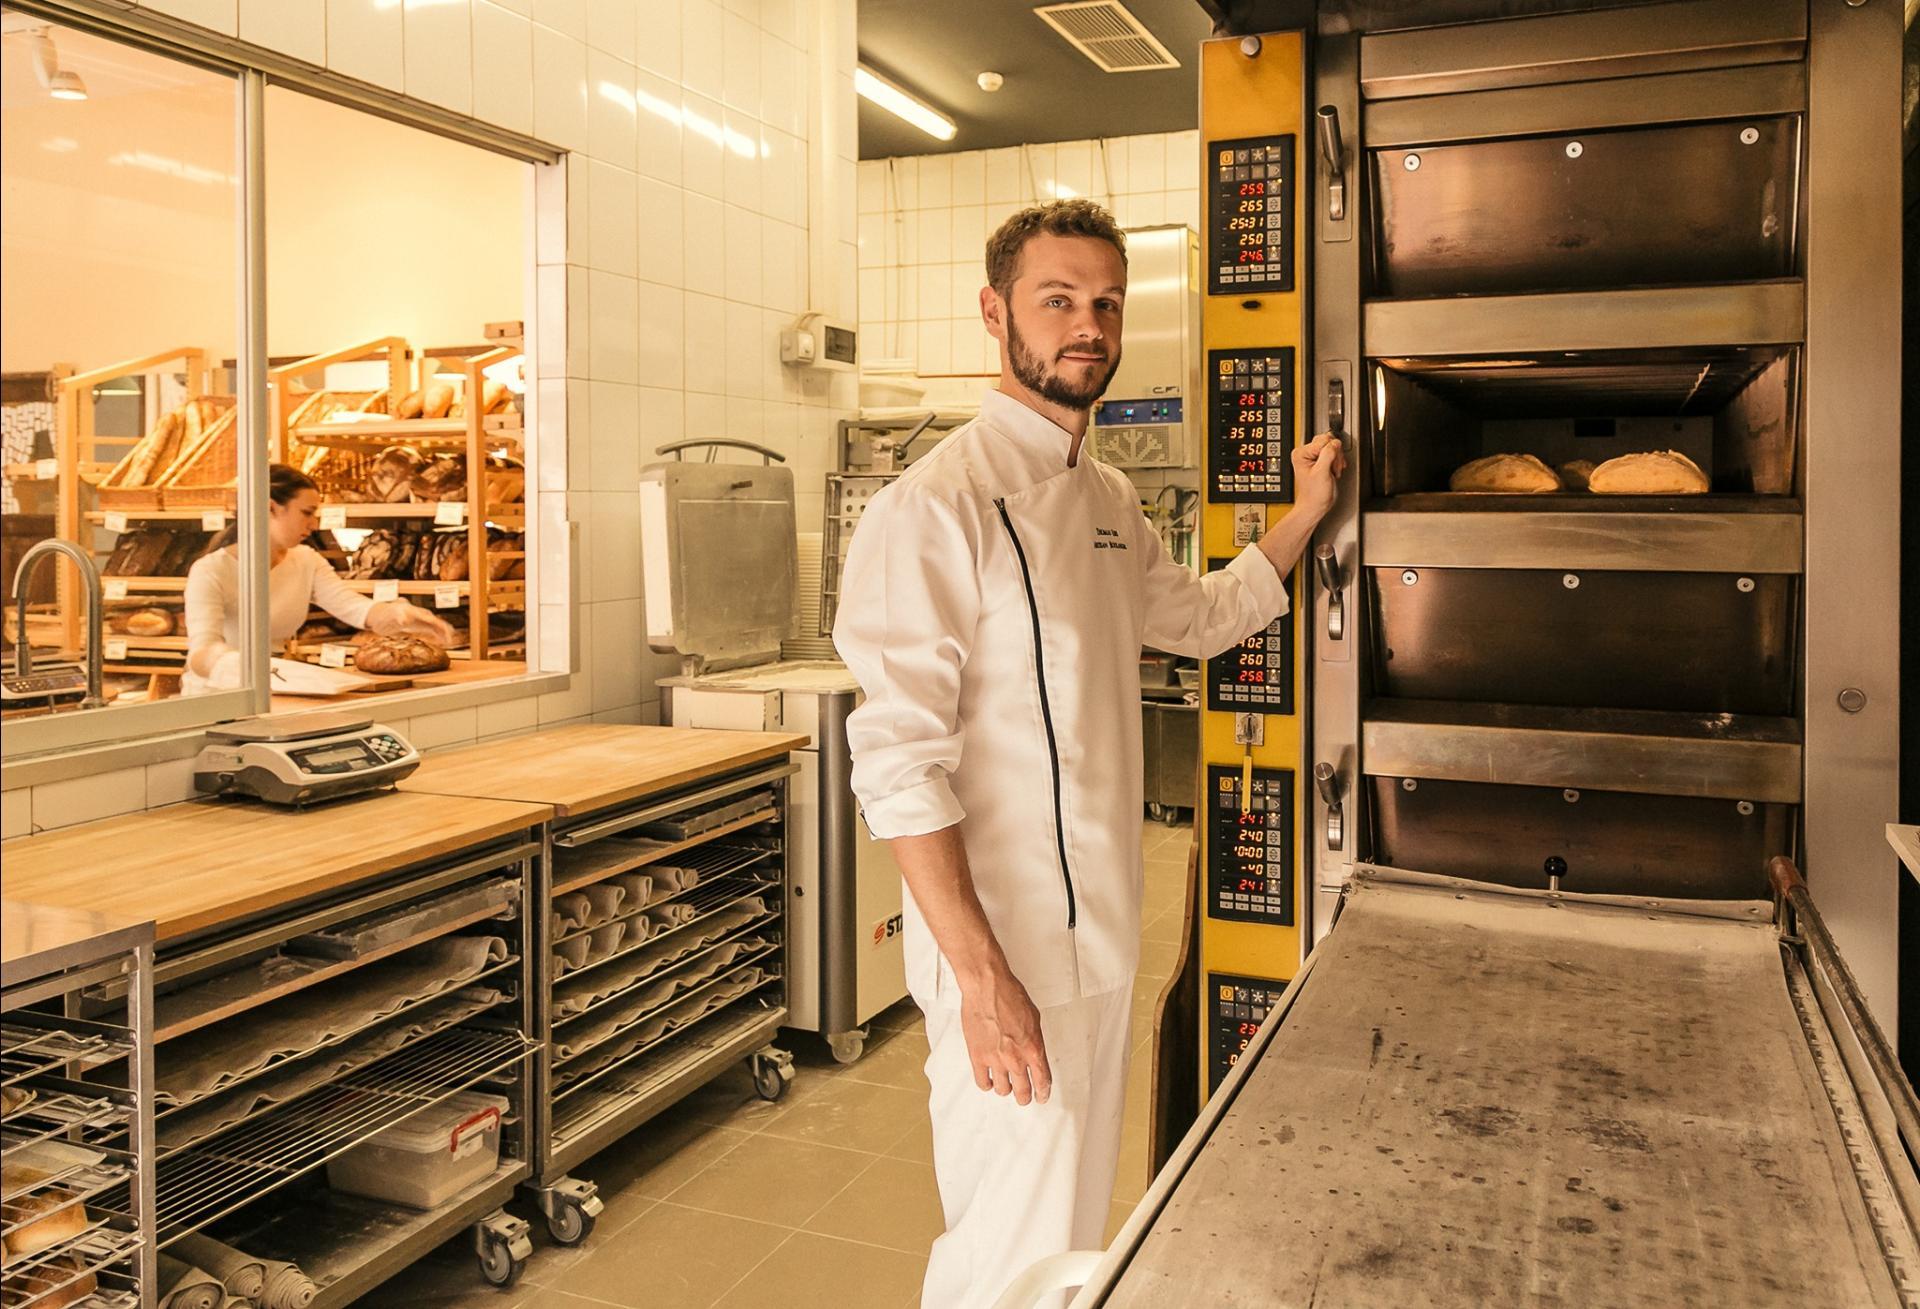 Cum facem maia naturală acasă, în 4 pași simpli, cu Tom Rees, patiser boulanger Pain Plaisir